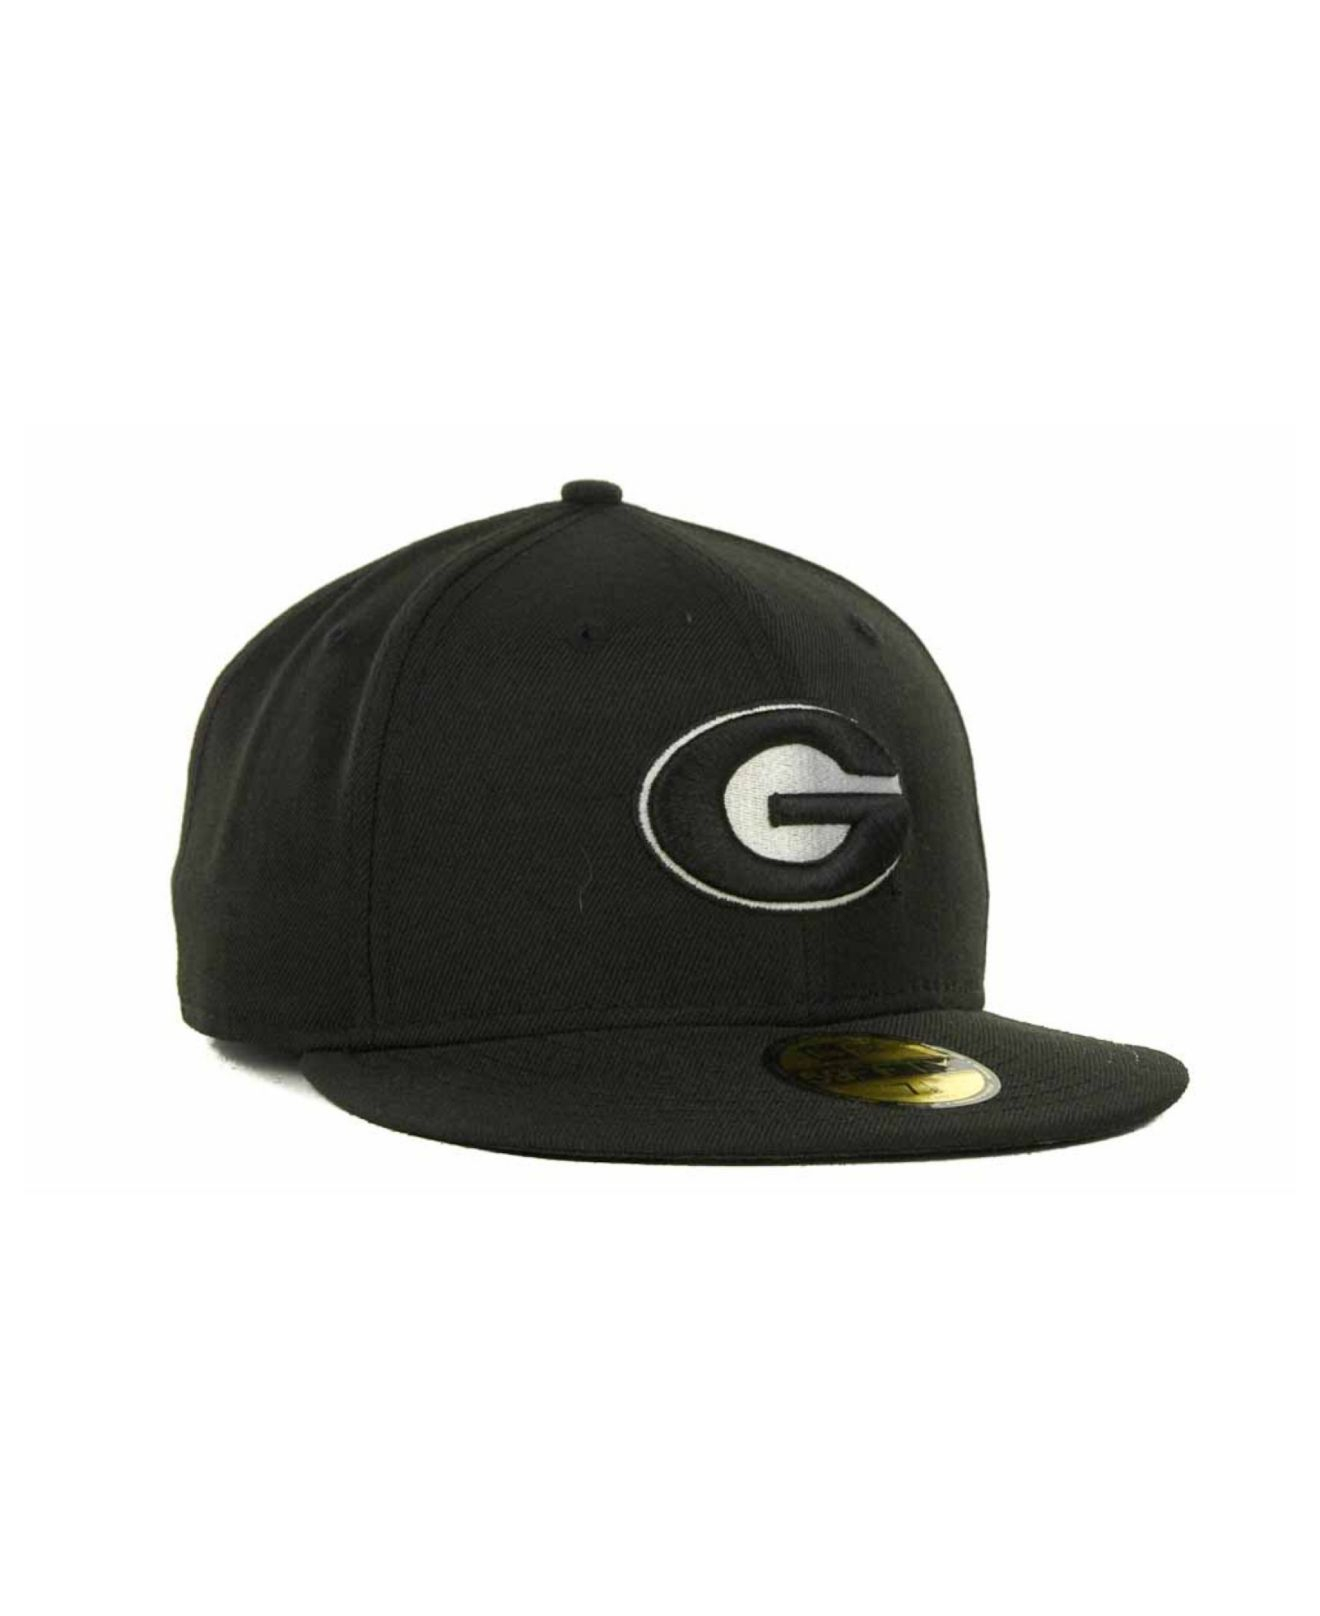 Georgia Bulldog Fitted Hats: Ktz Georgia Bulldogs Black On Black With White